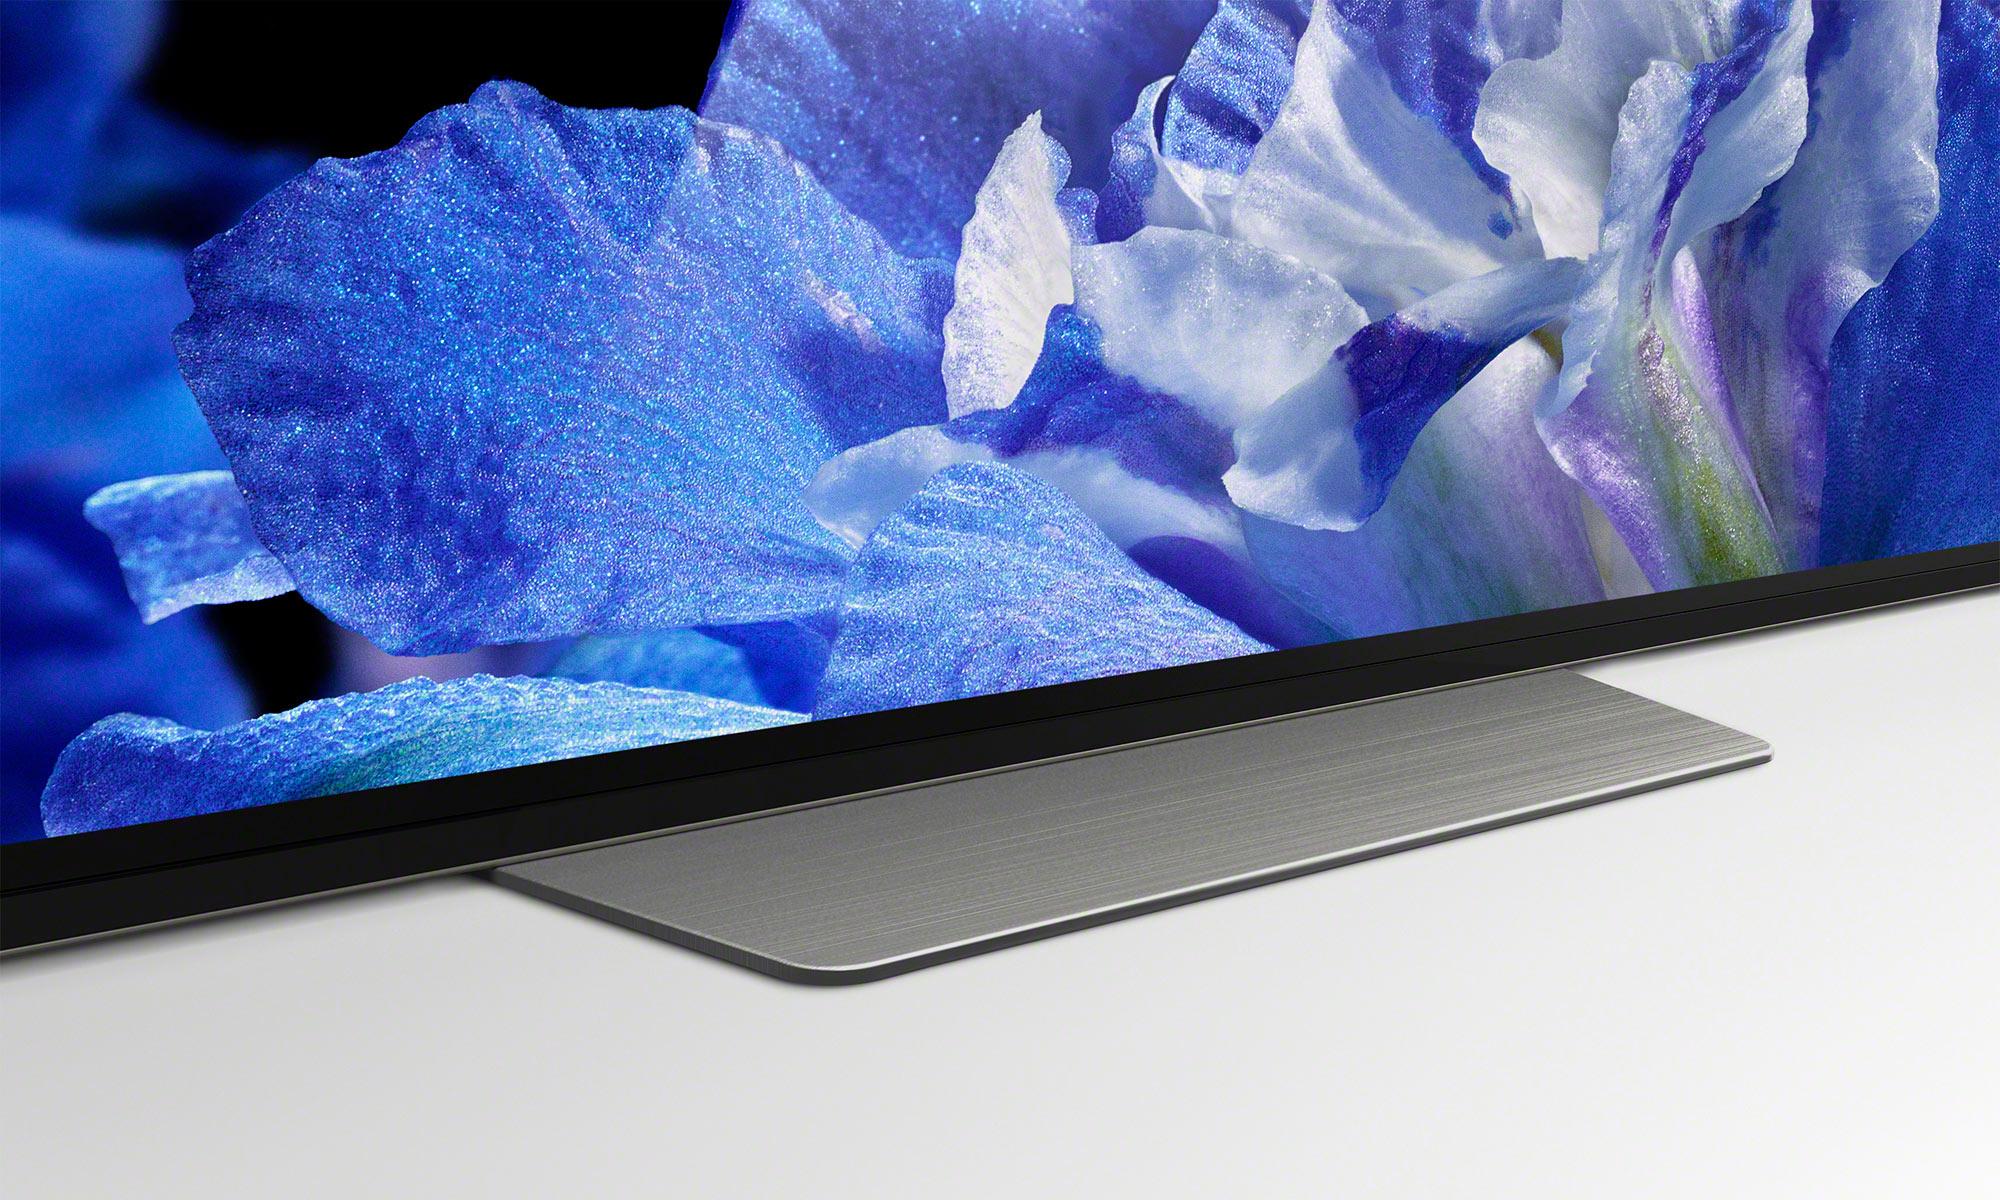 Sony Bravia AF8 OLED A8F Ultra HD 4K HDR10 Plus Smart TV 2018 Stand